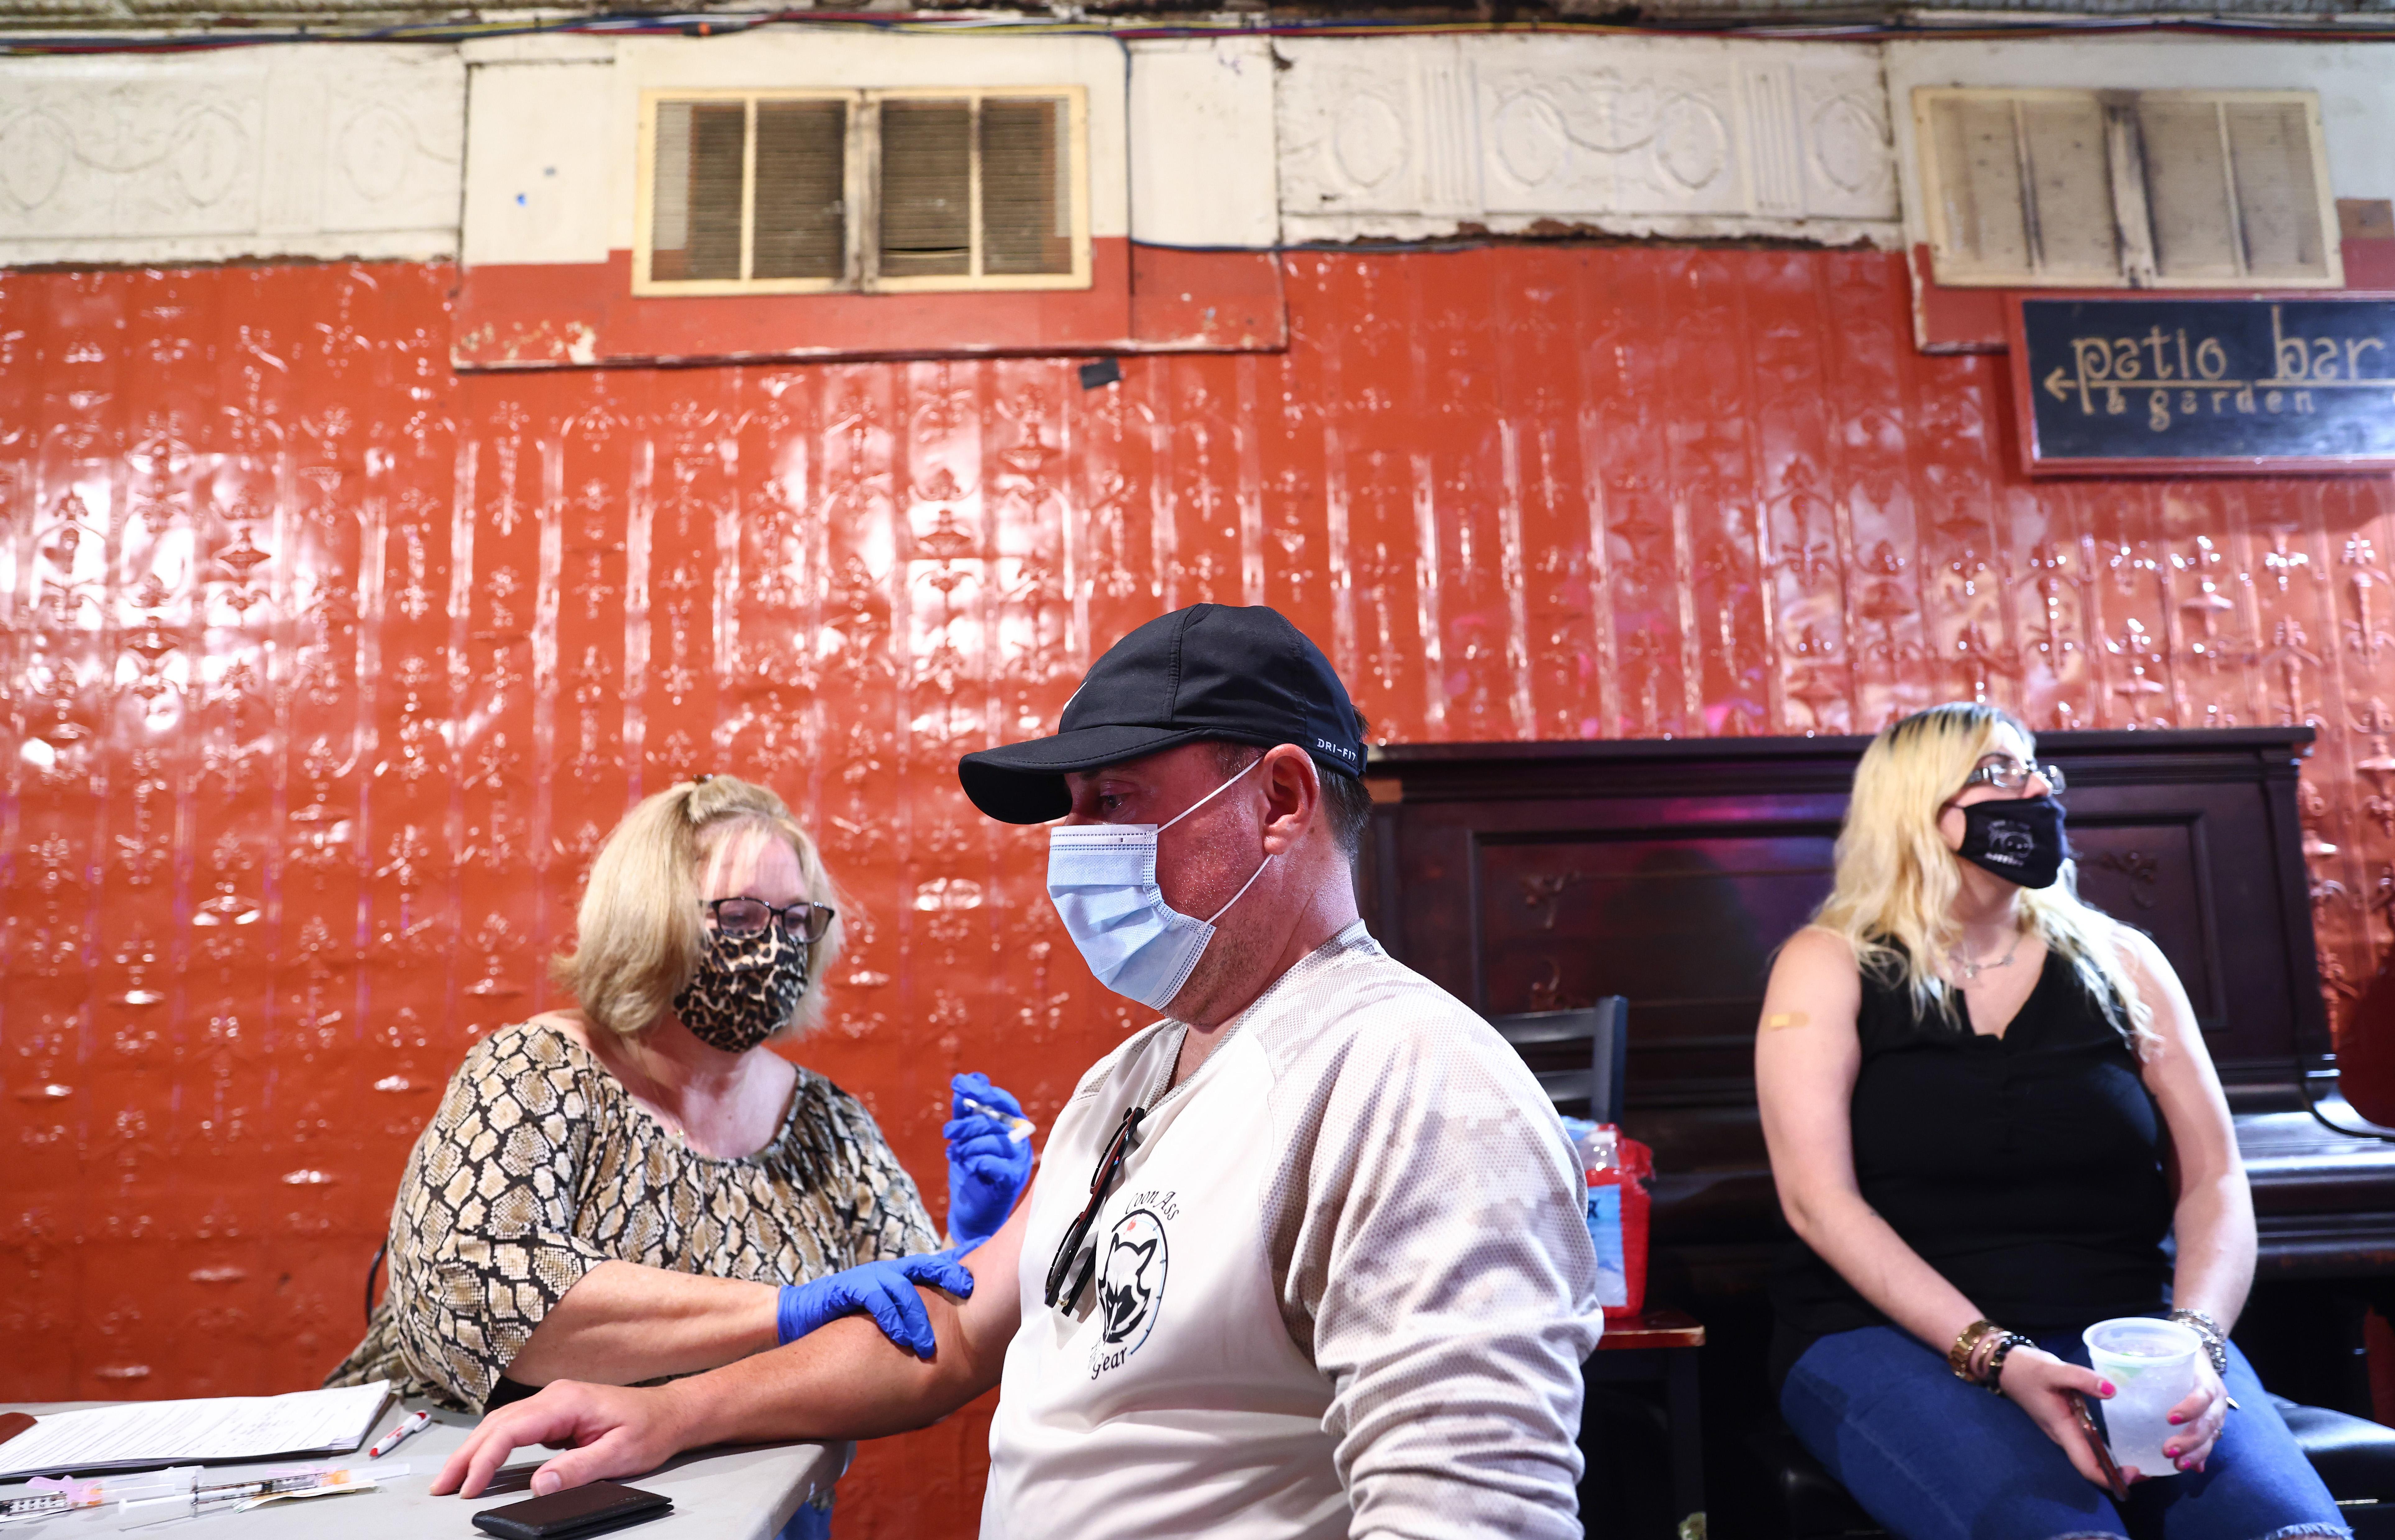 Louisiana Leads U.S. In New COVID-19 Cases As Hospitalizations Soar